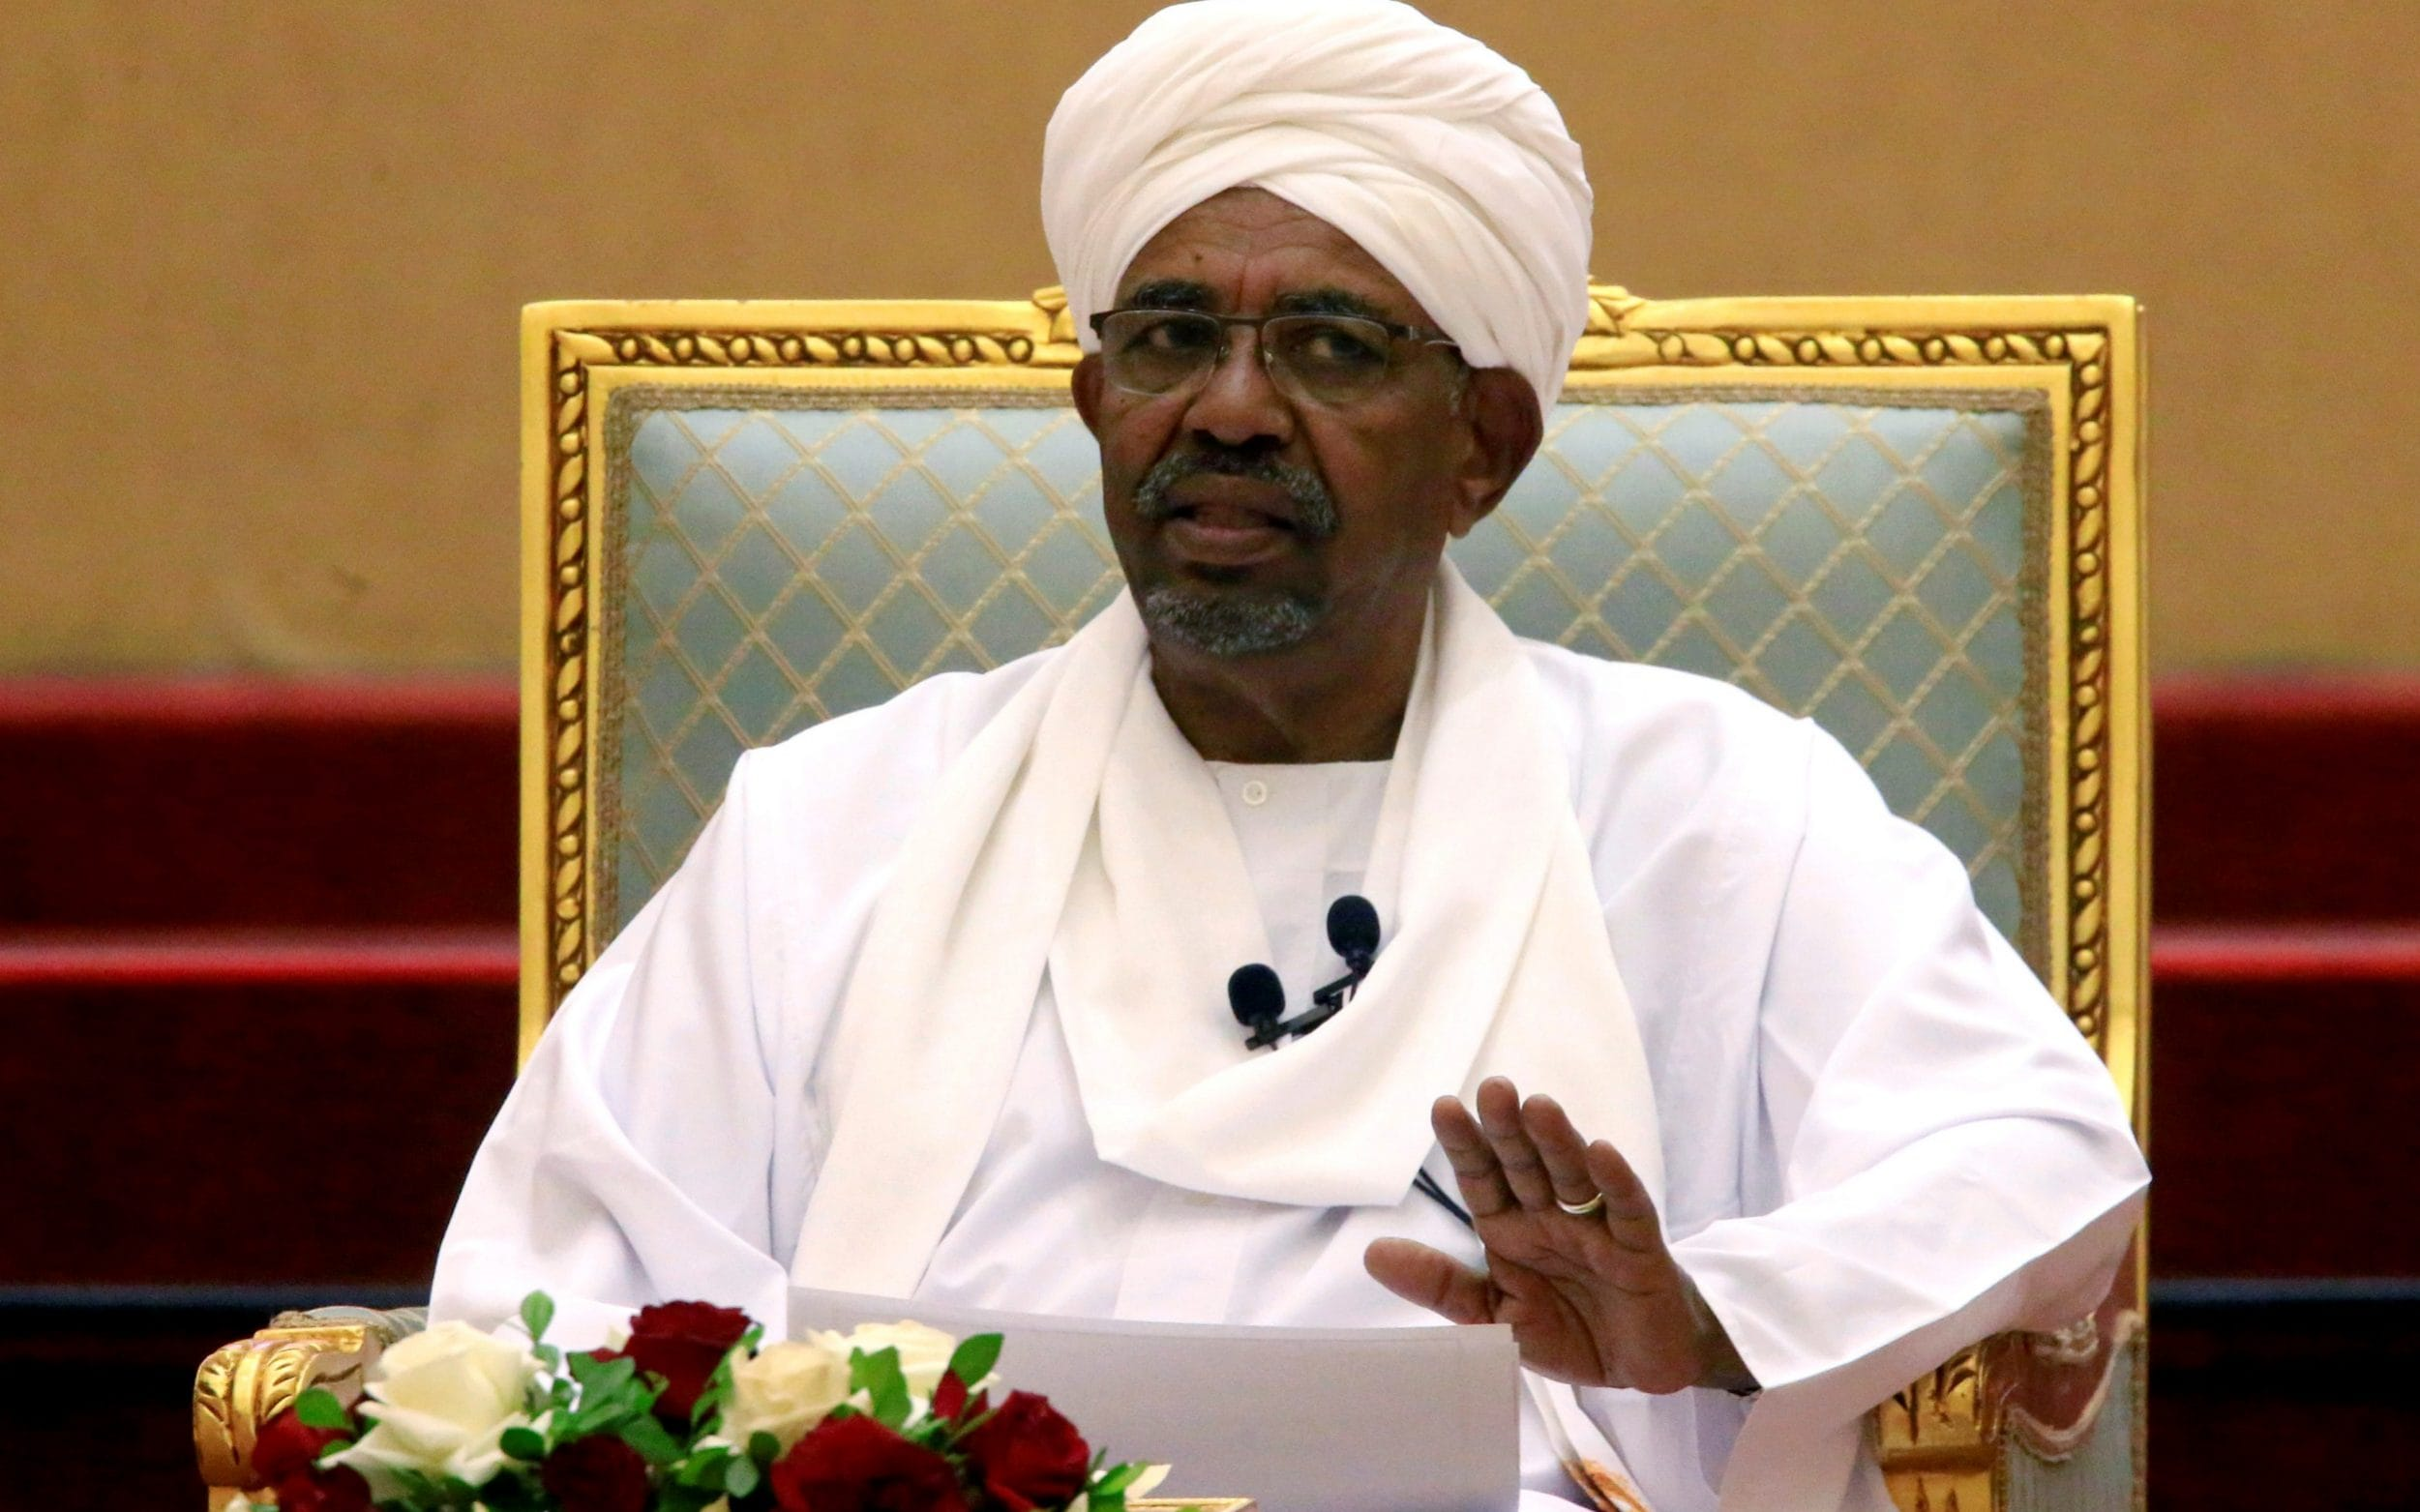 Sudans former dictator Omar al-Bashir due in court for corruption trial